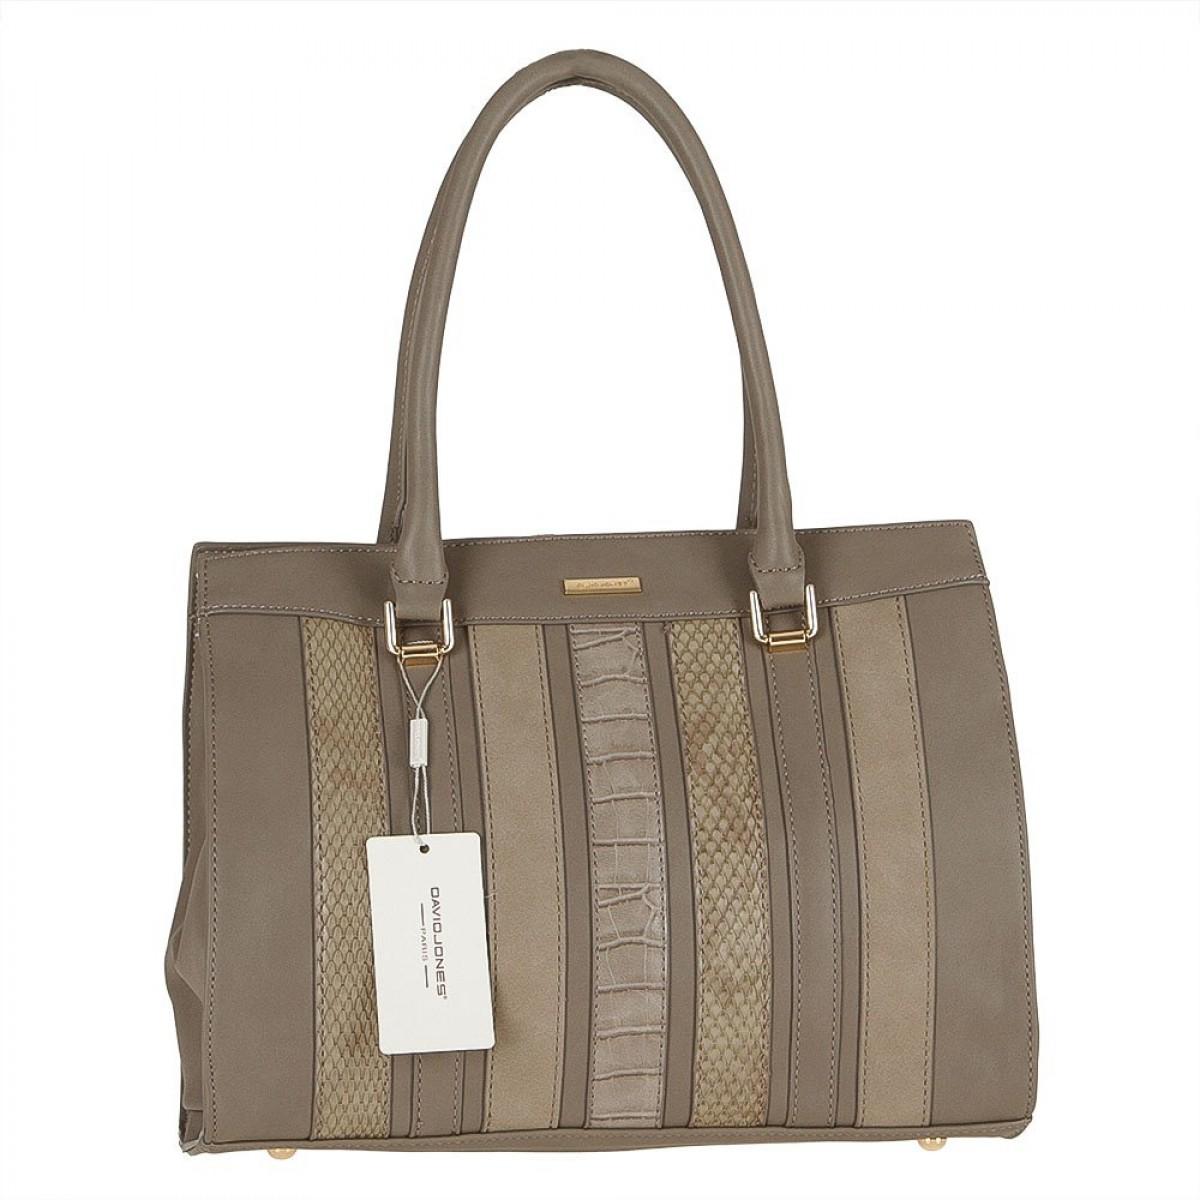 Жіноча сумка David Jones 5622-2 TAUPE